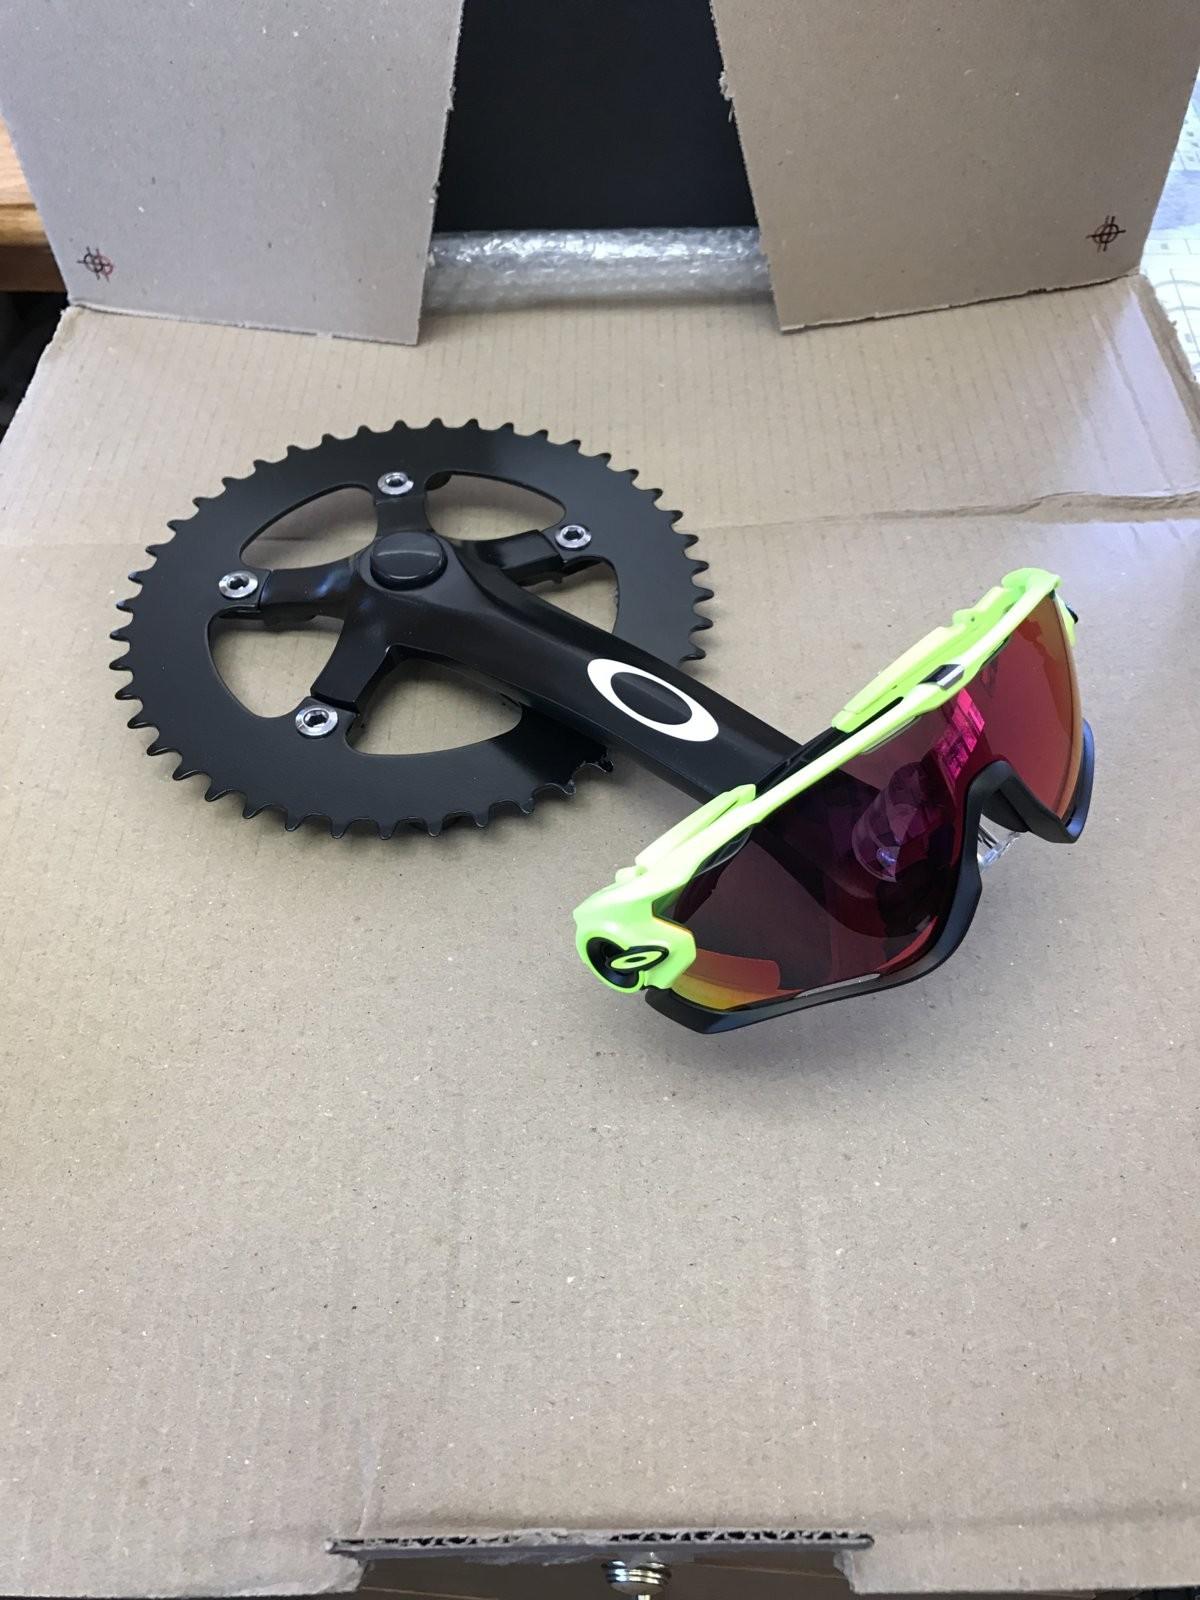 Cyclingtips Jawbreaker - IMG_3194.JPG